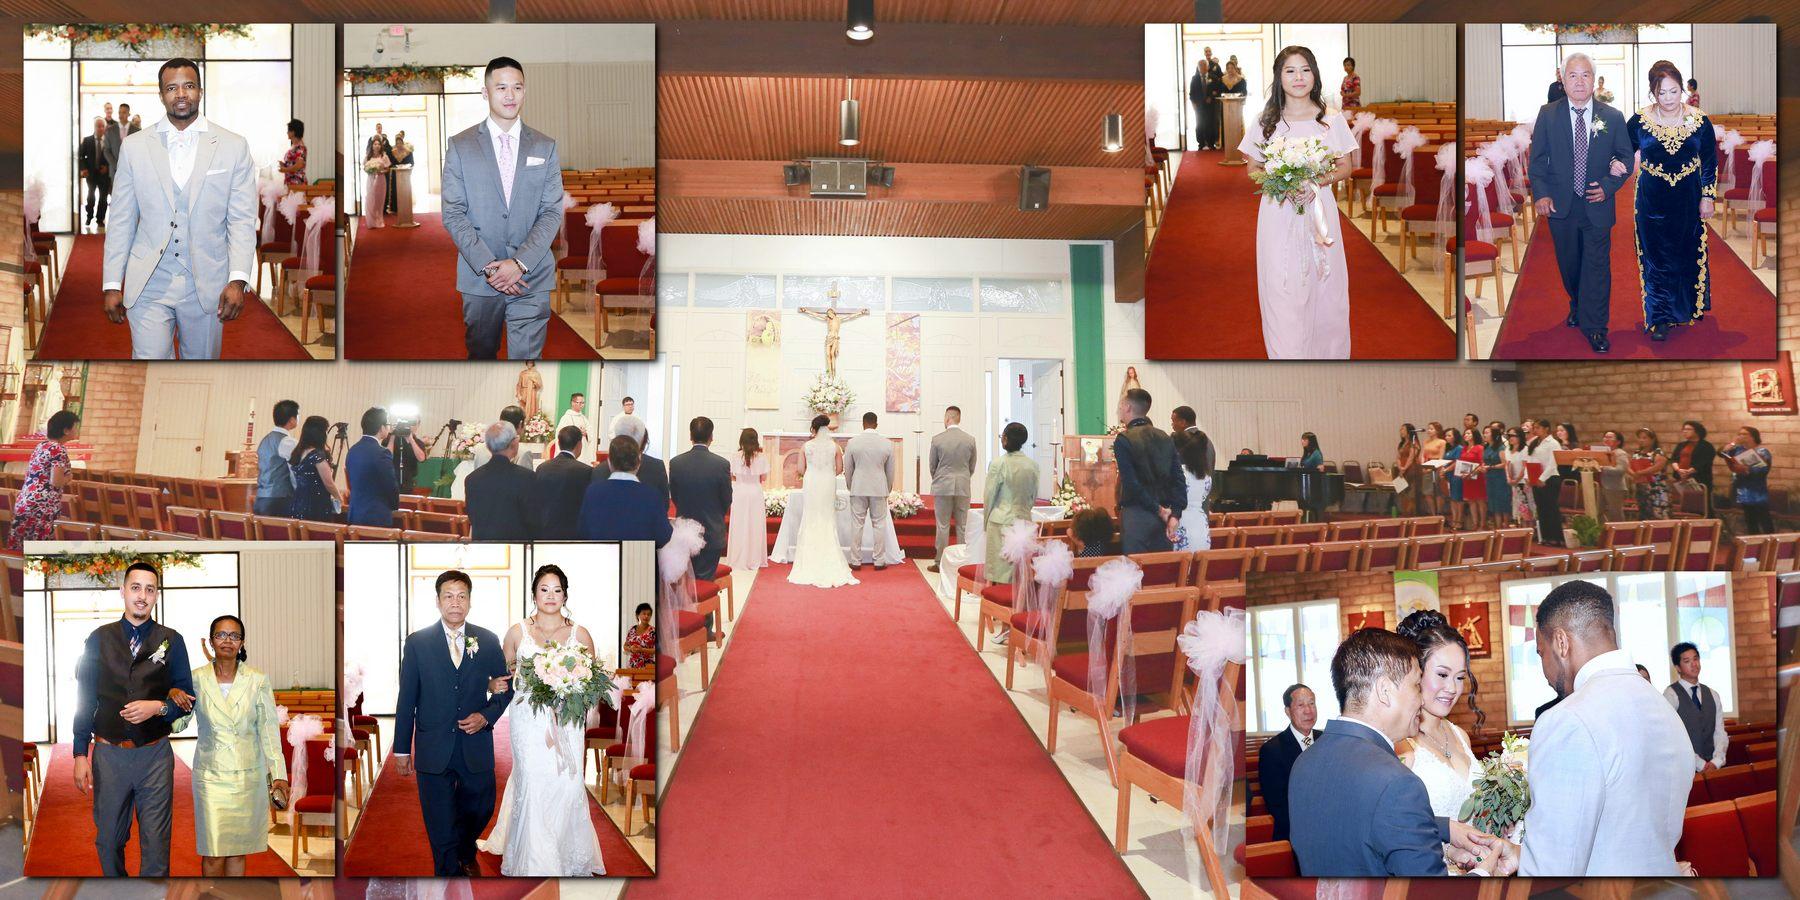 Keneisha wedding album 006 (Sides 10-11)